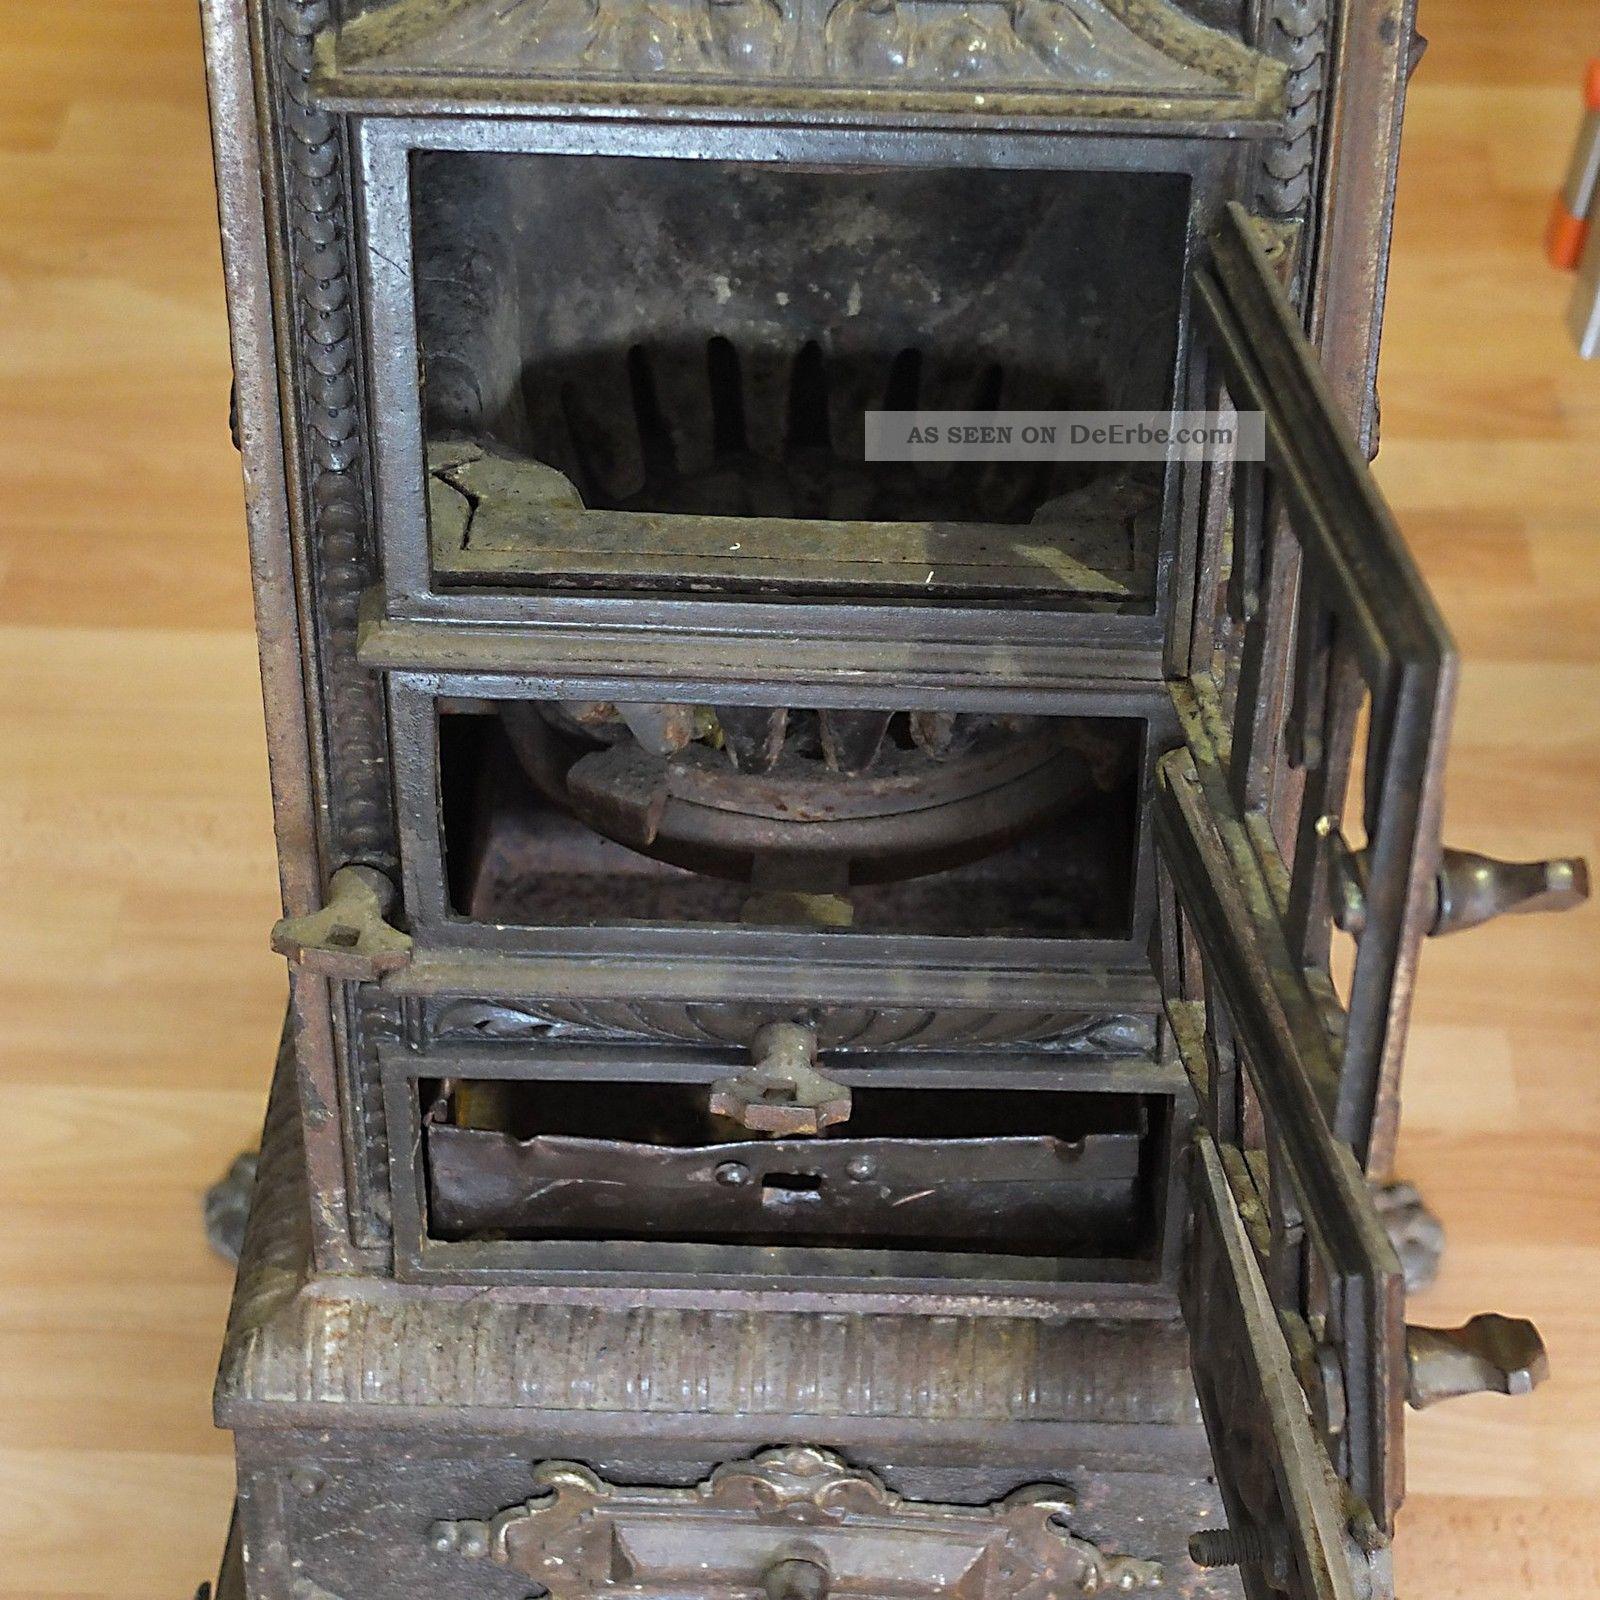 Alter Antiker Ofen Gussofen Historismus Kanonenofen Kamin Herd Feuerstelle